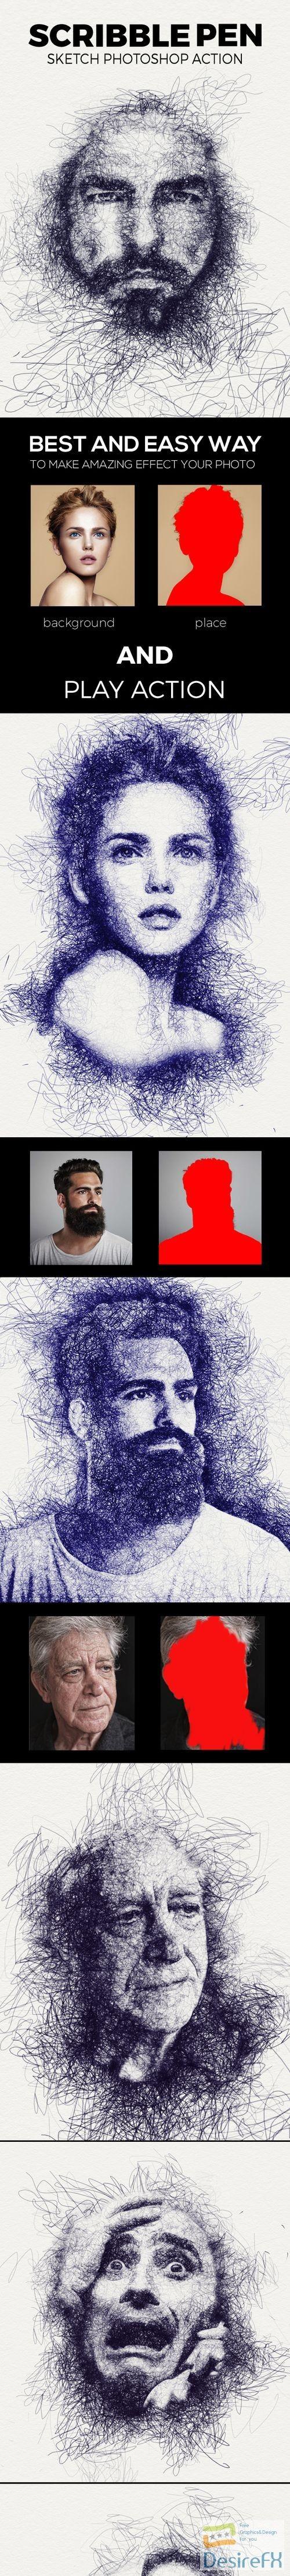 Scribble Pen Sketch Photoshop Action 21886396 Graphicsdesign For Pentul Men